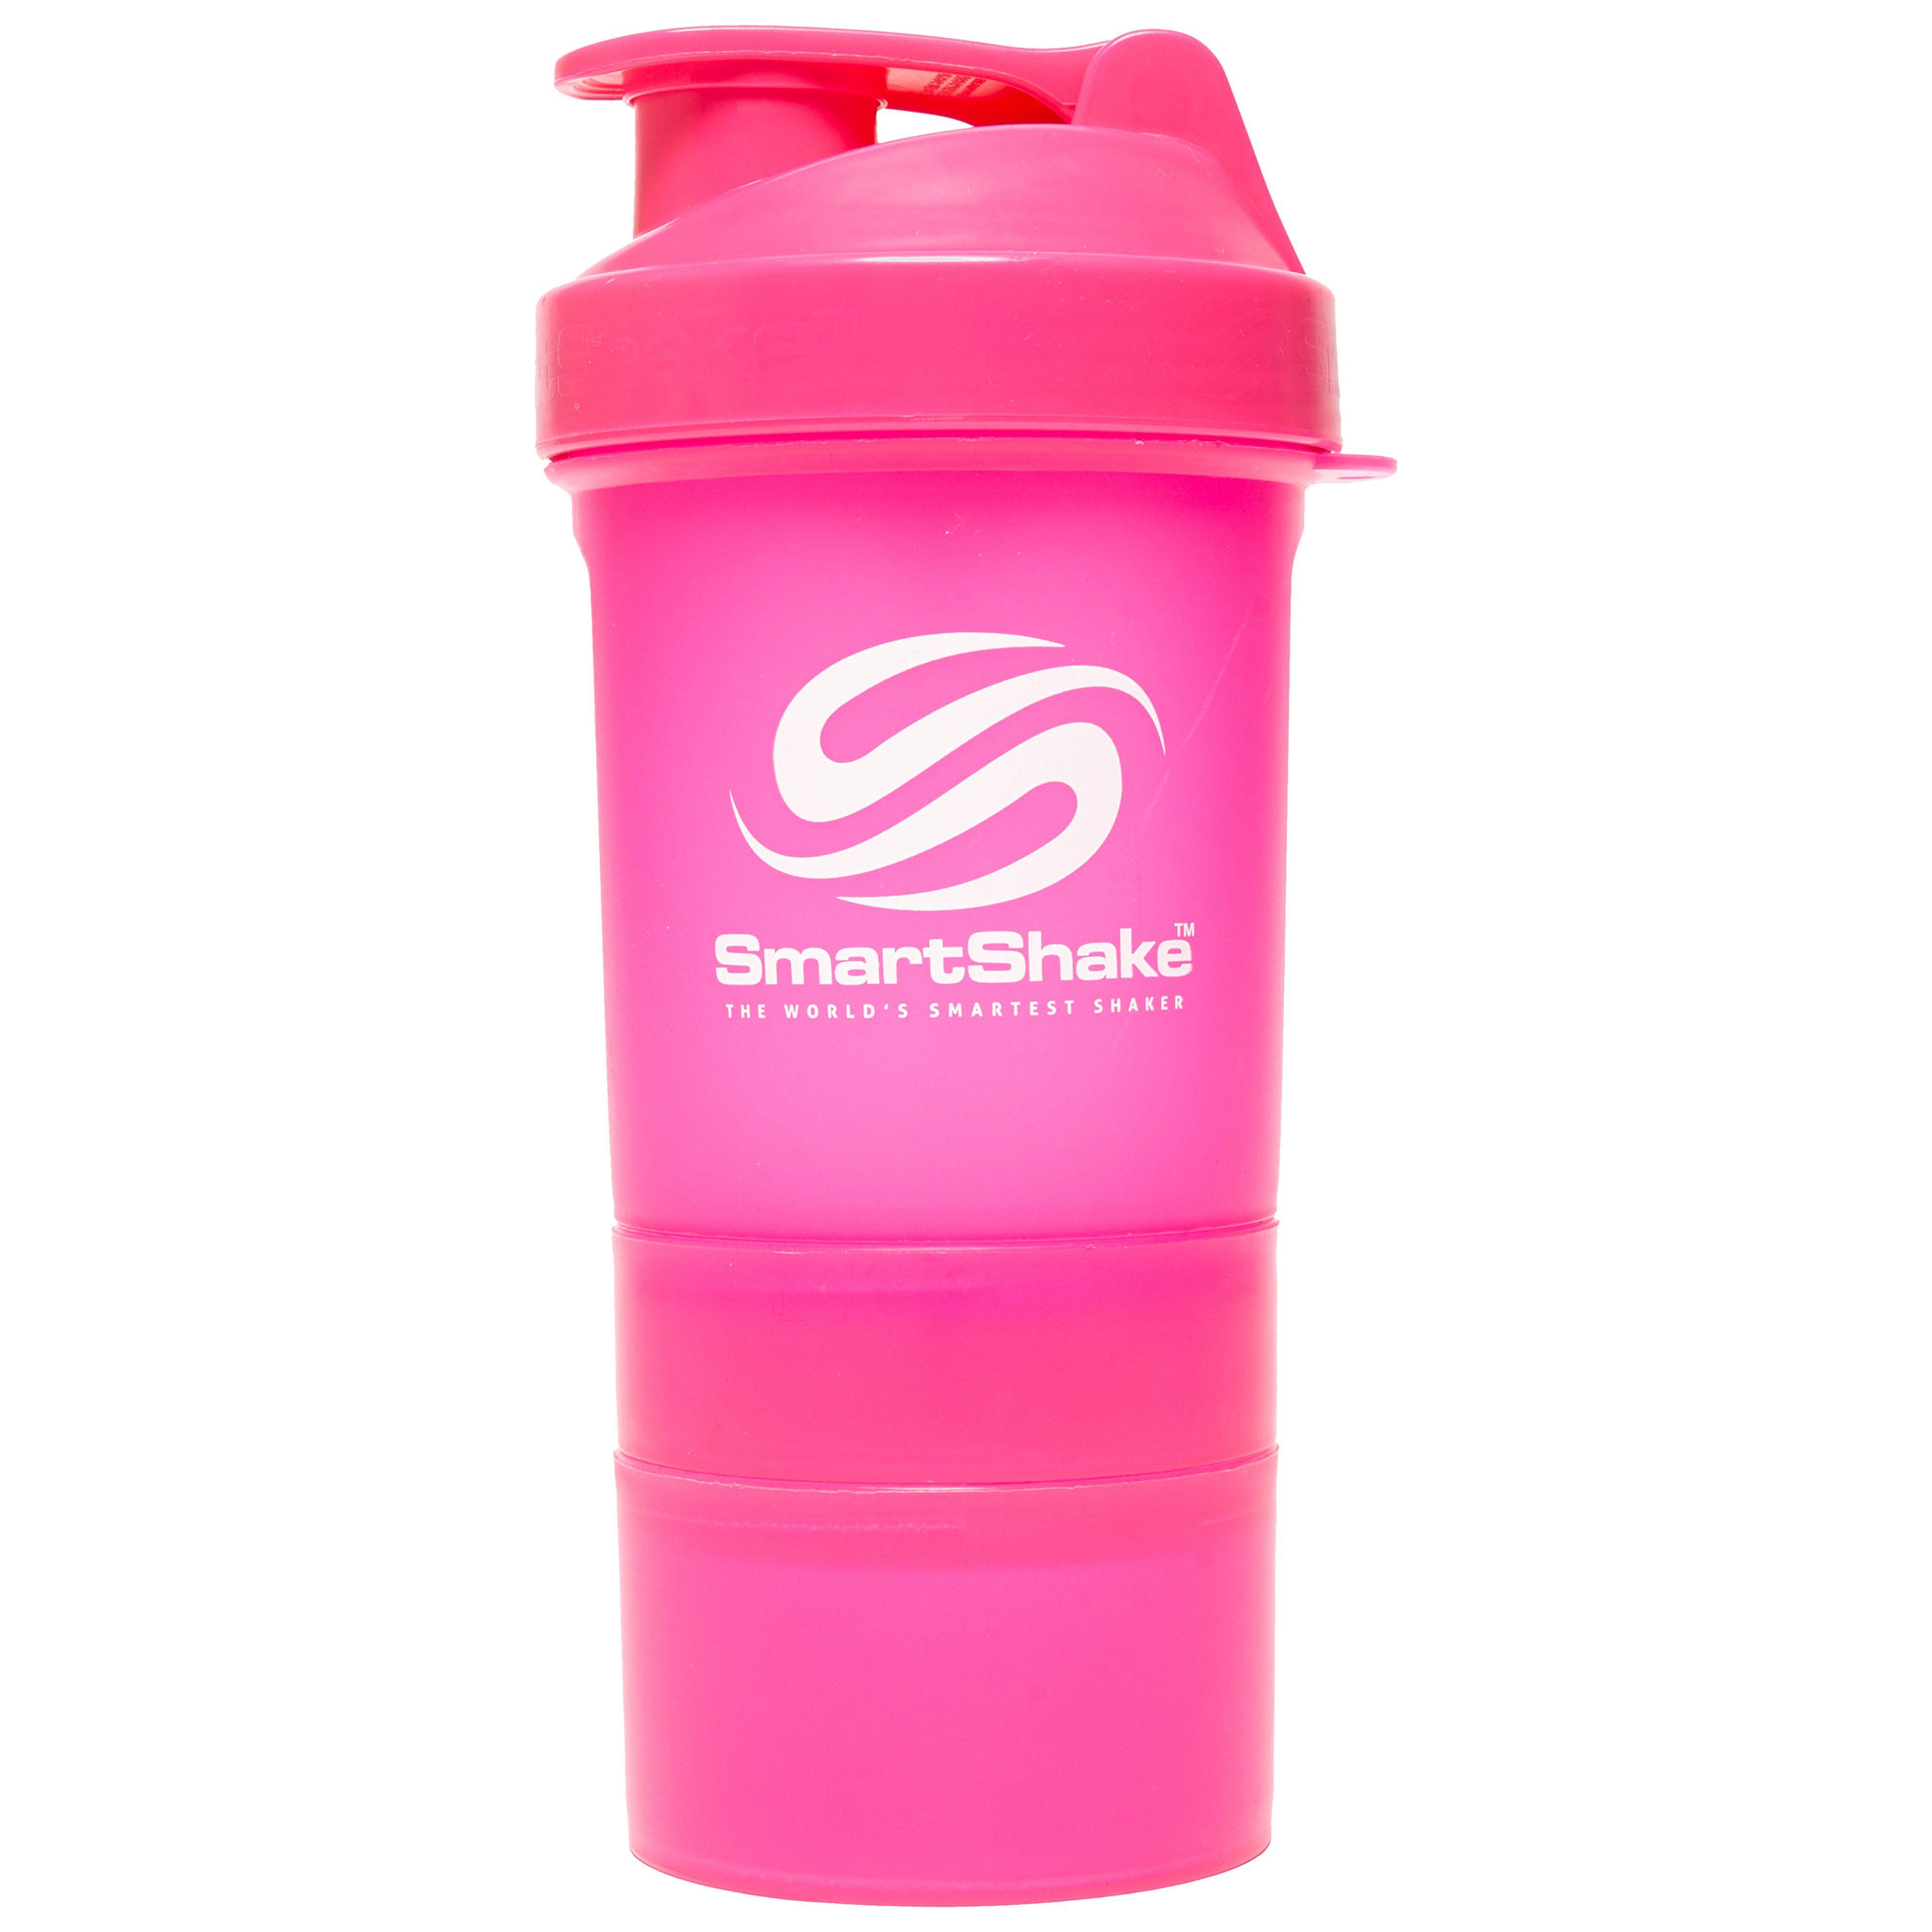 Smart Shake Original Shaker Cup